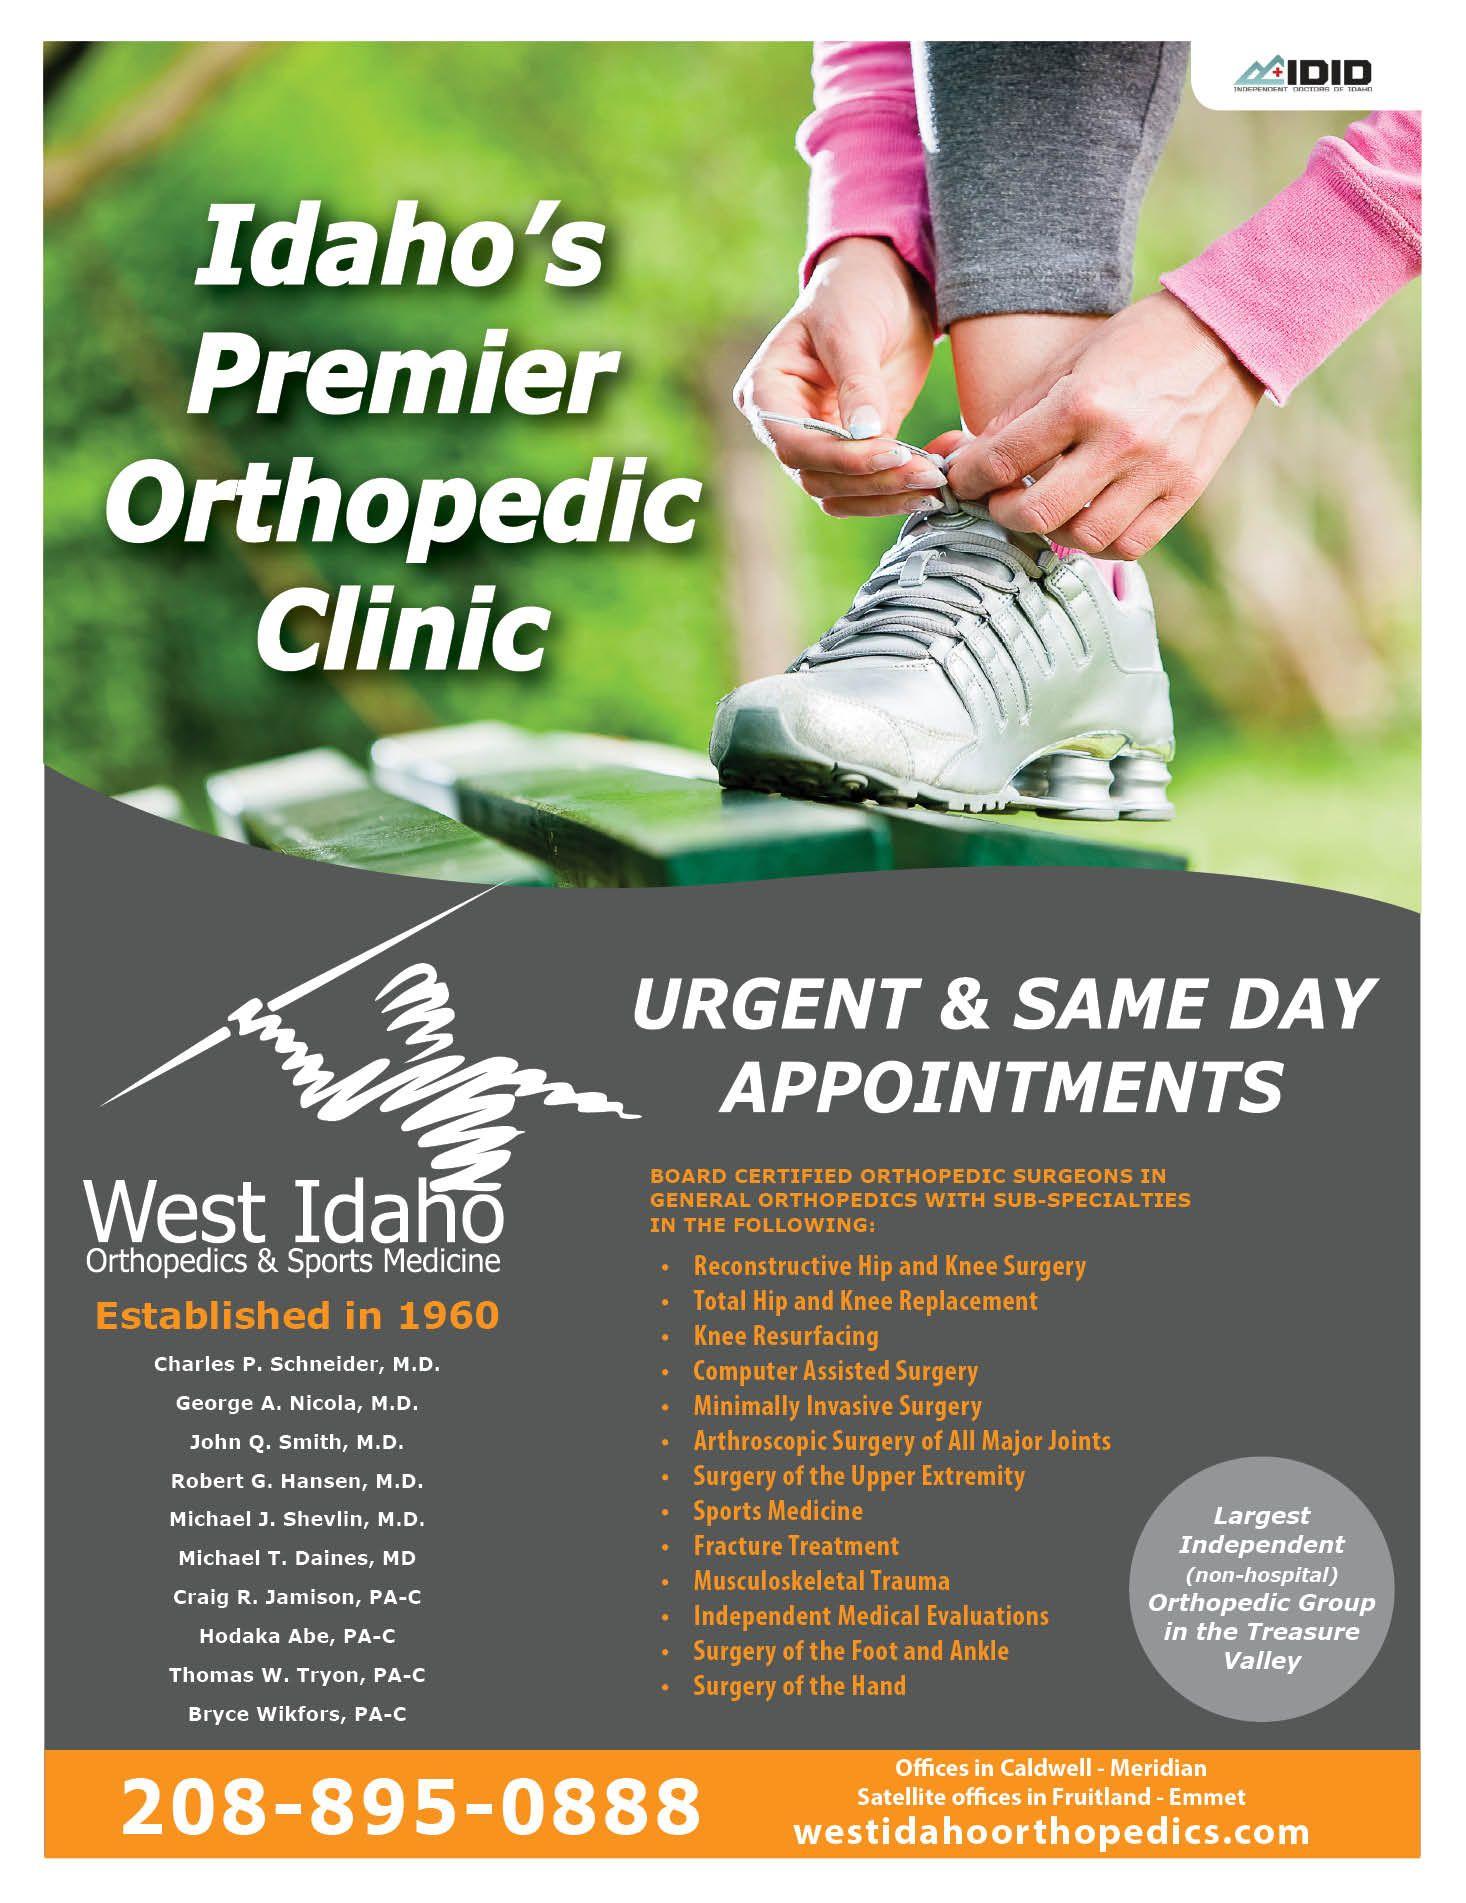 West Idaho Orthopedic & Sports Medicine. We manage their